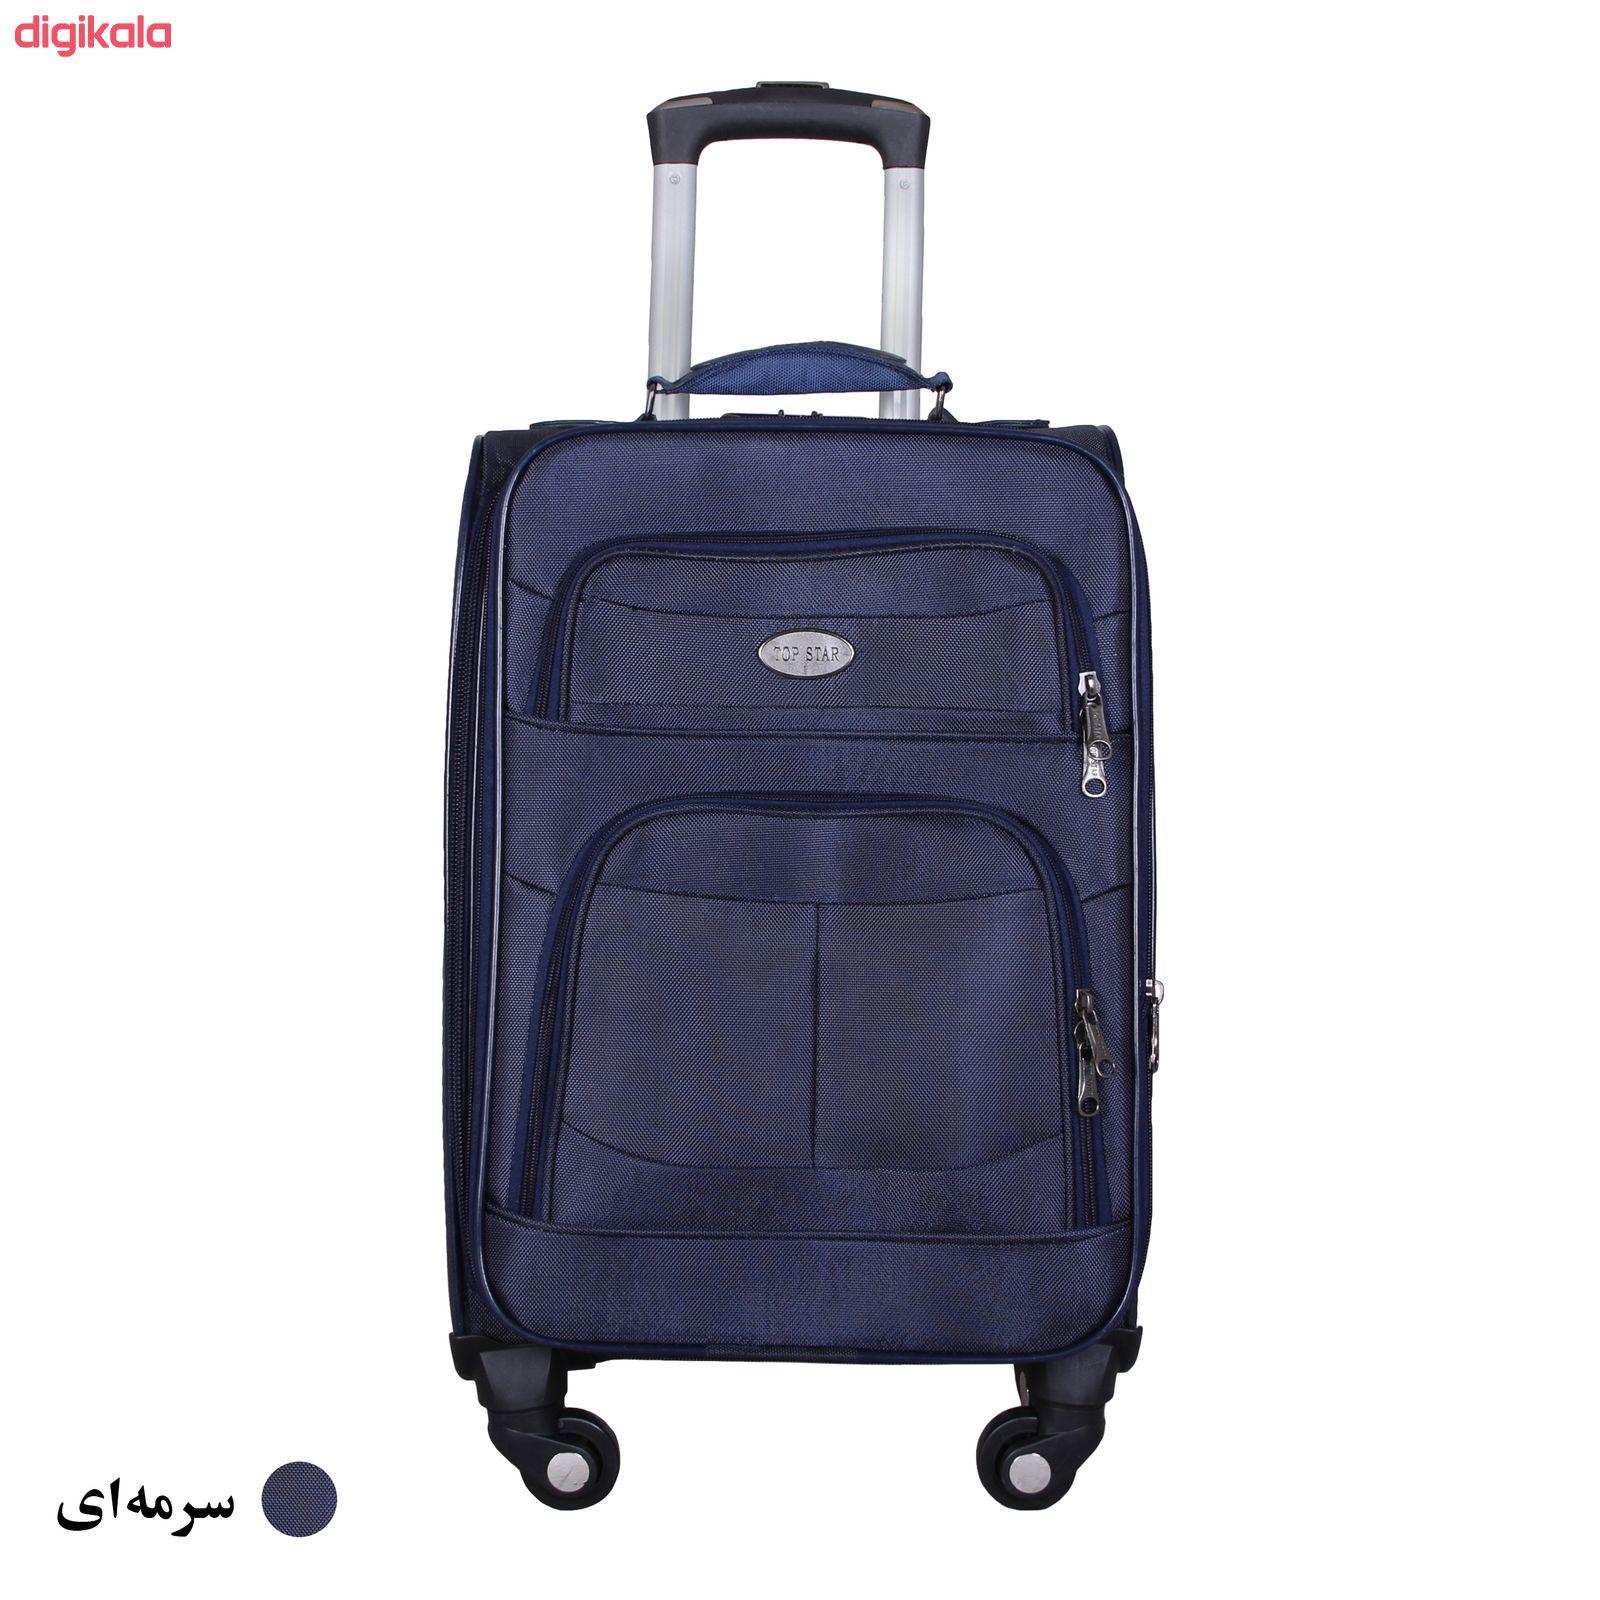 مجموعه سه عددی چمدان کدA1034 main 1 4